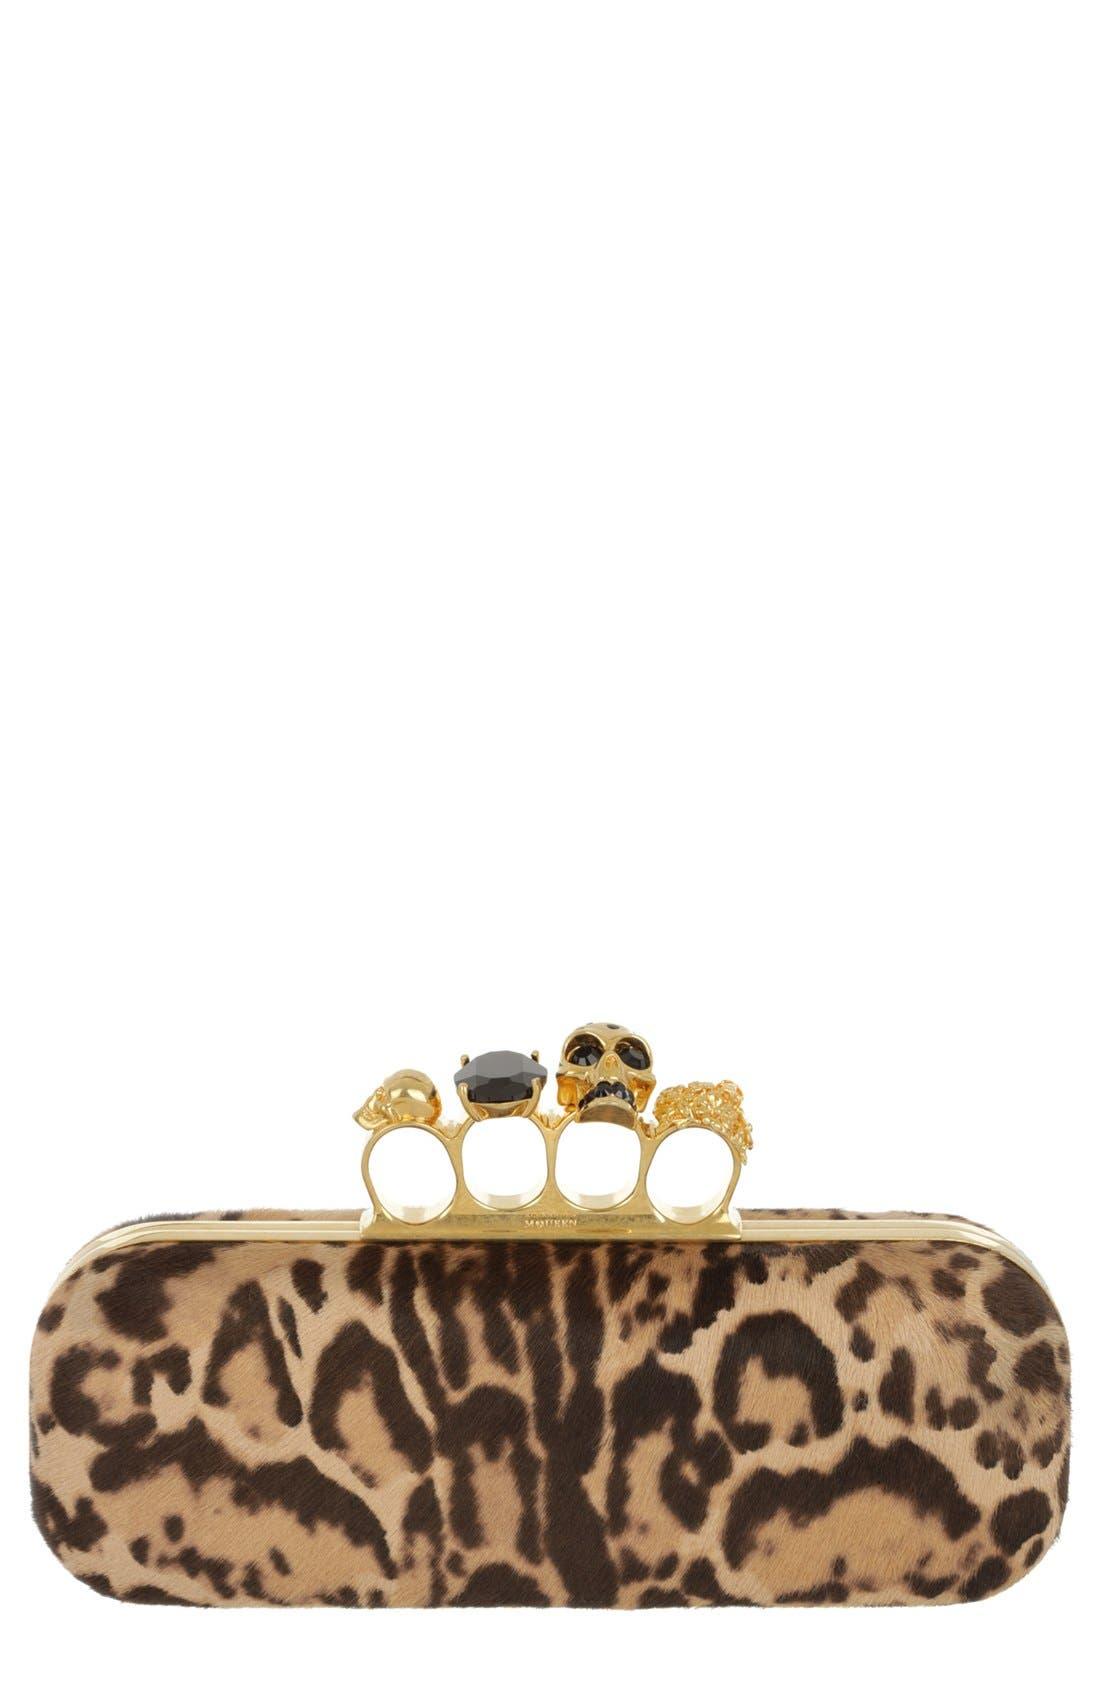 Alternate Image 1 Selected - Alexander McQueen 'Knucklebox' Leopard Print Calf Hair Clutch